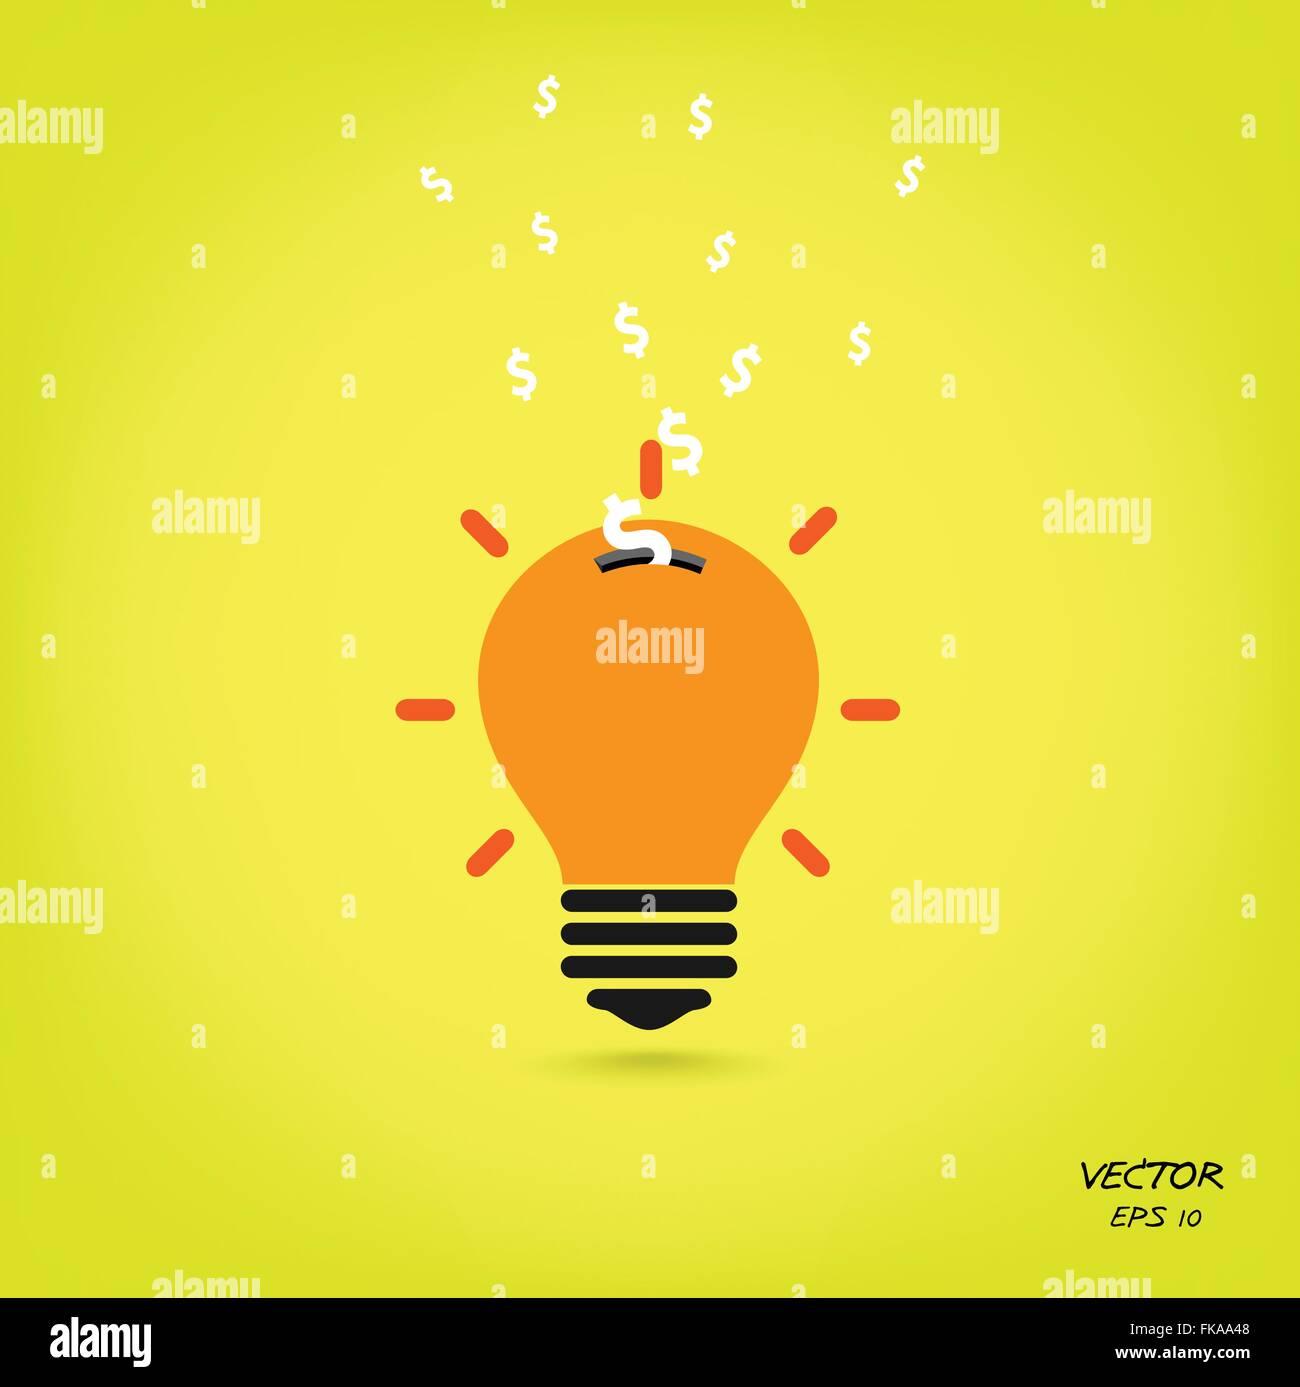 creative light bulb,saving sign,ideas concepts,business background.vector illustration Stock Vector